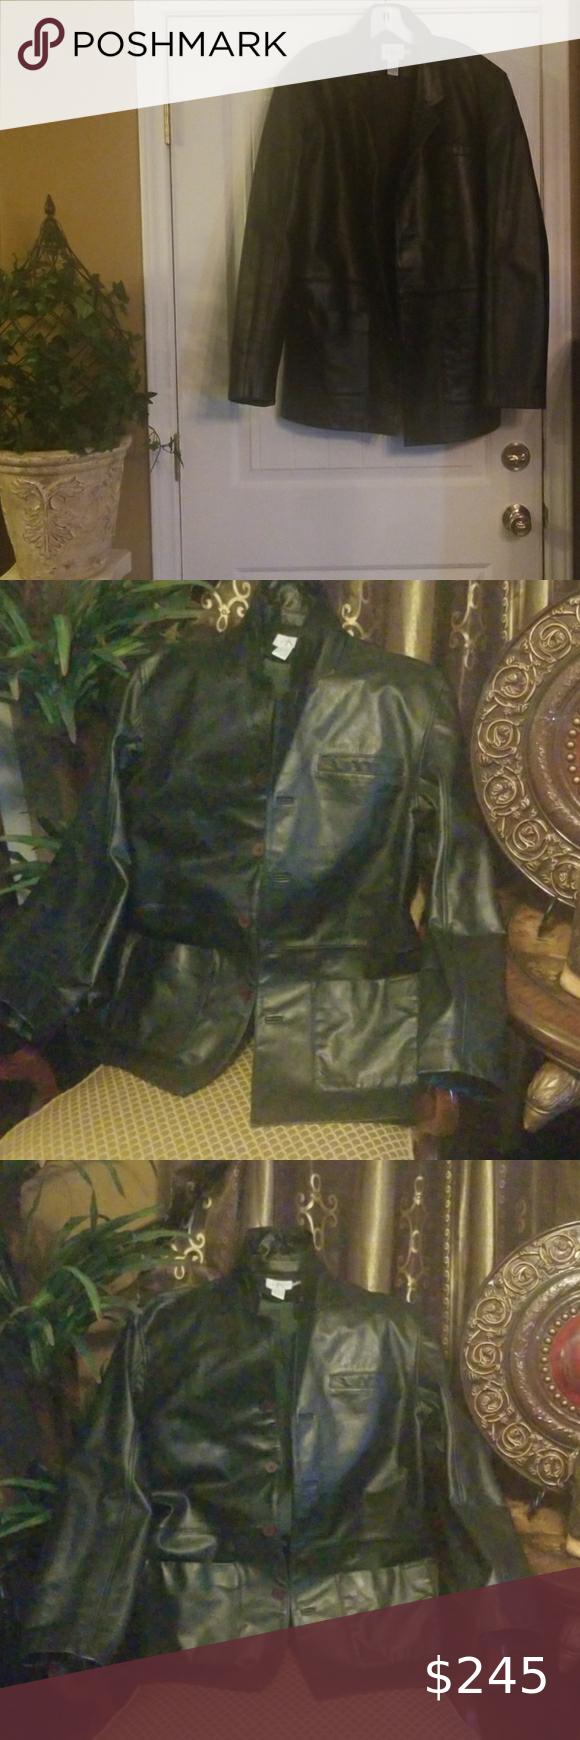 CALVIN KLEI JEANS Elegant leather jacket for men. Size is